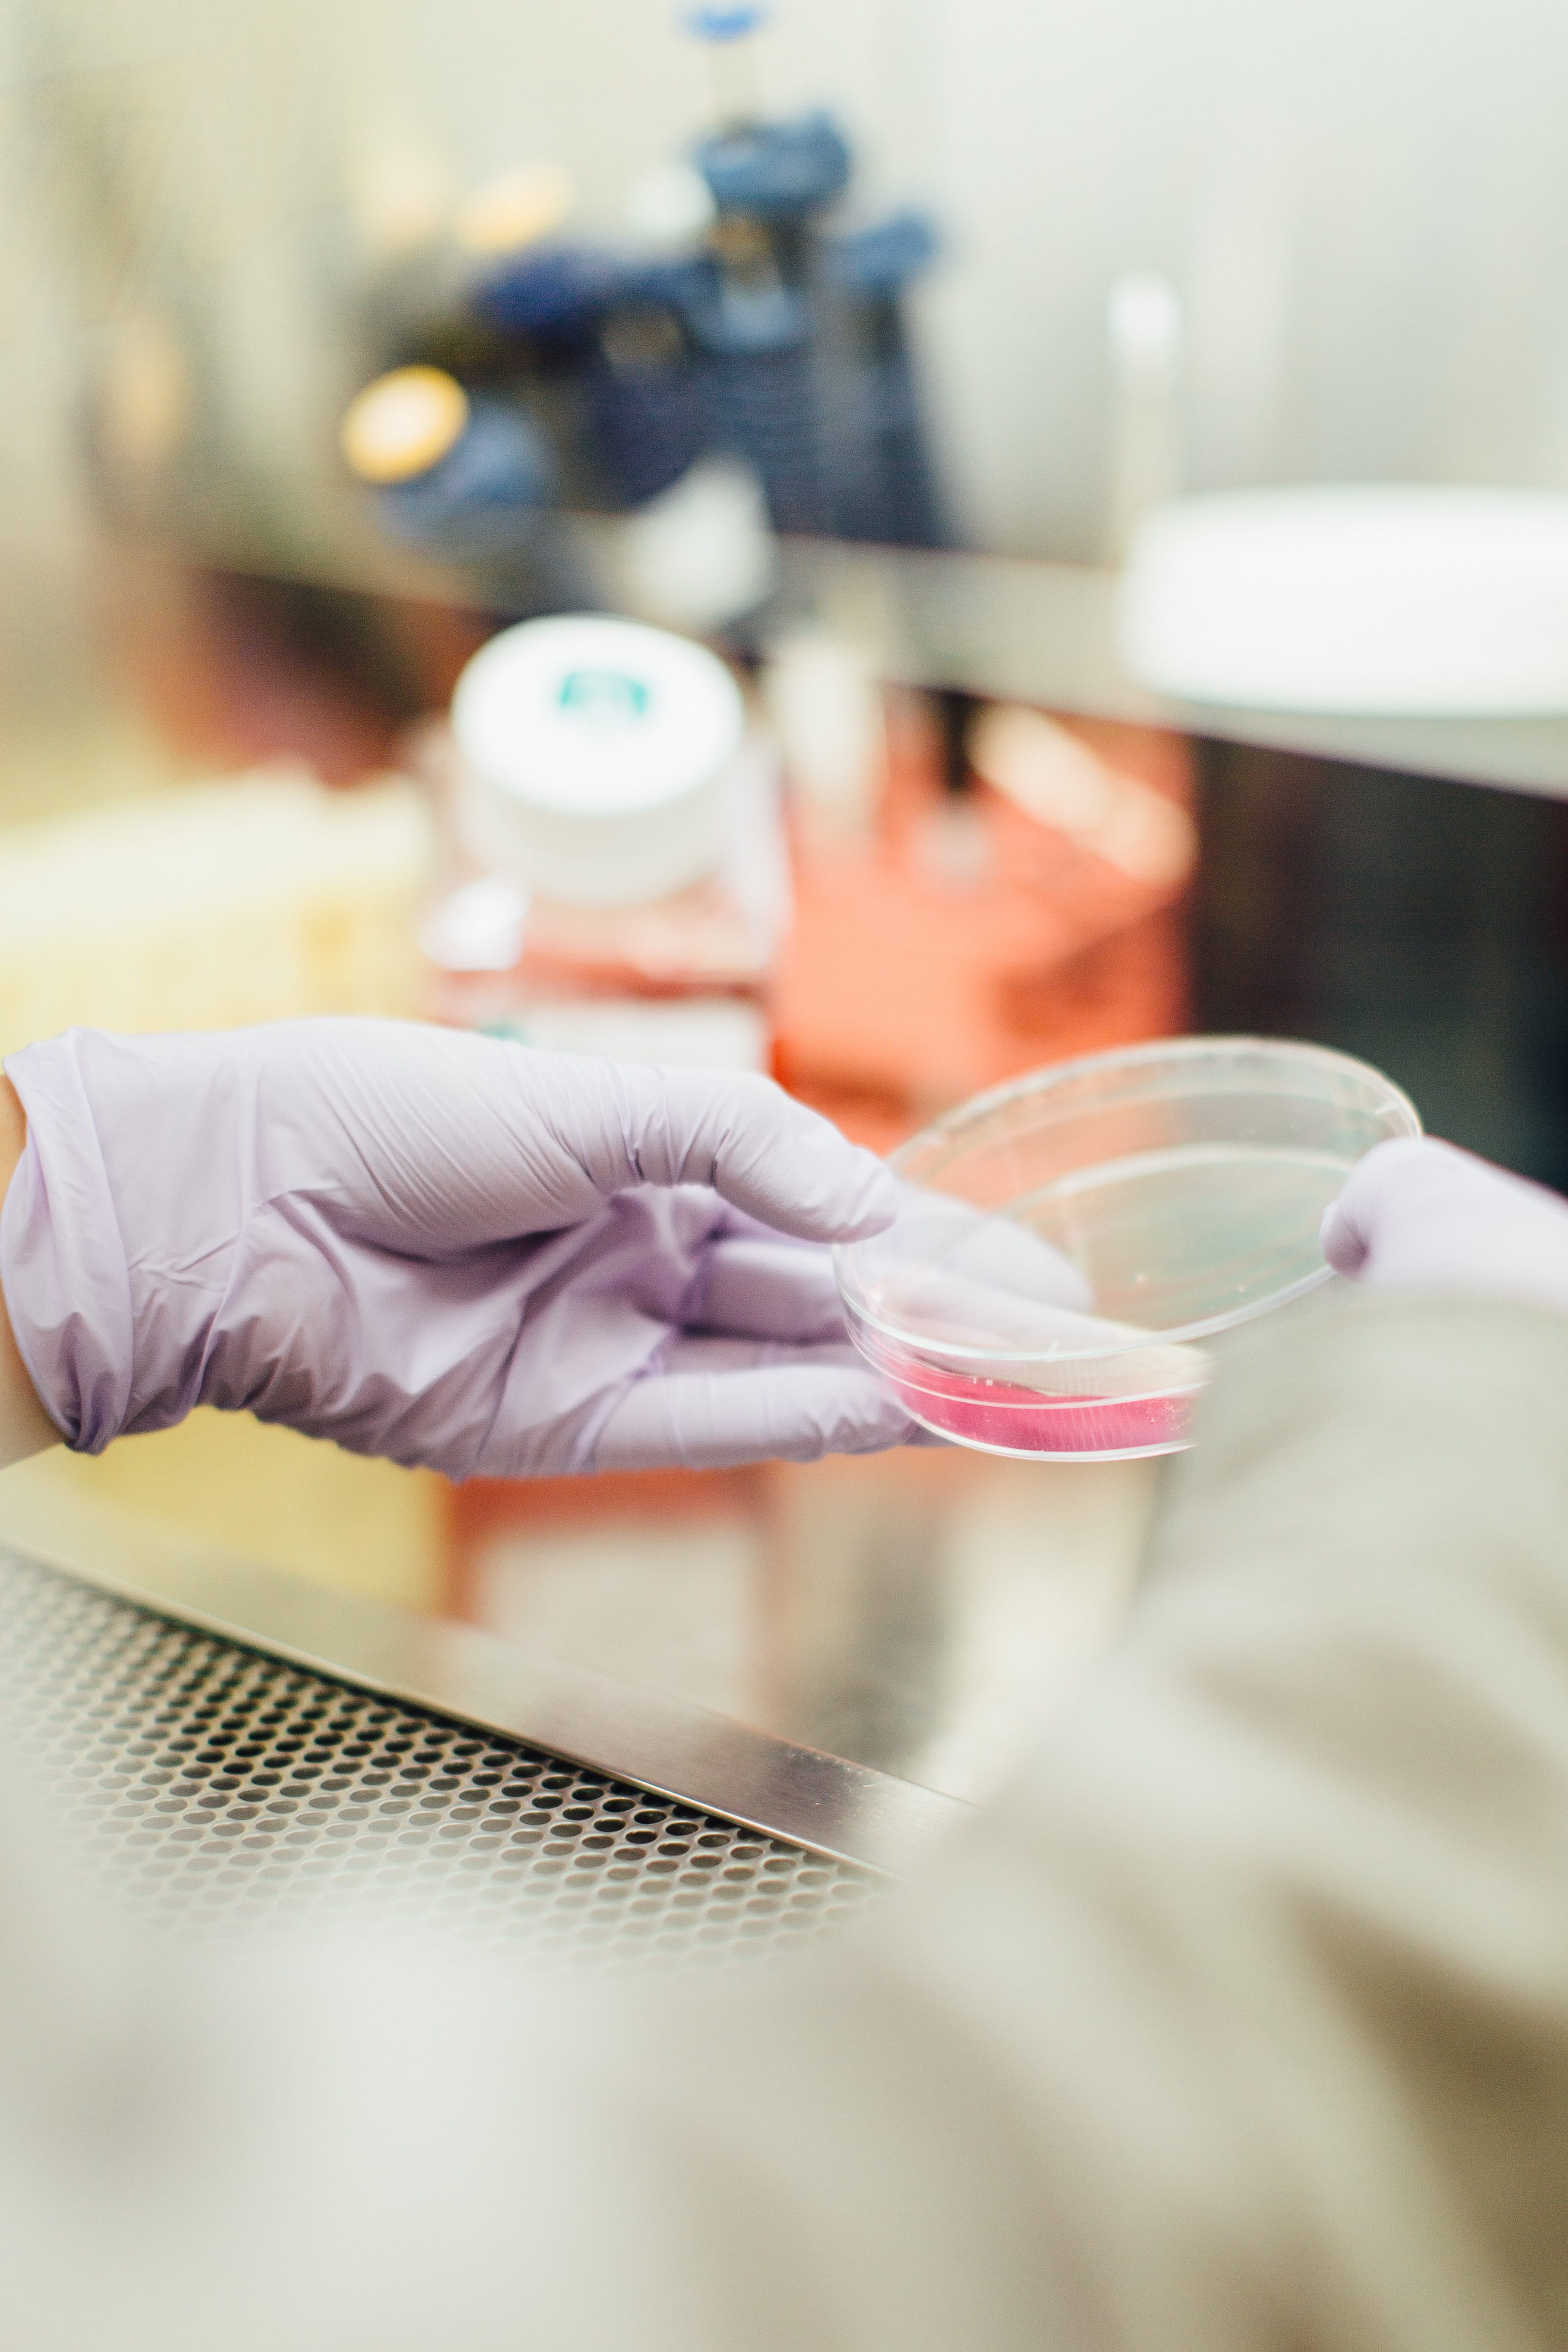 Lab technician holding Petri dish containing pink liquid; image by Drew Hays, via Unsplash.com.